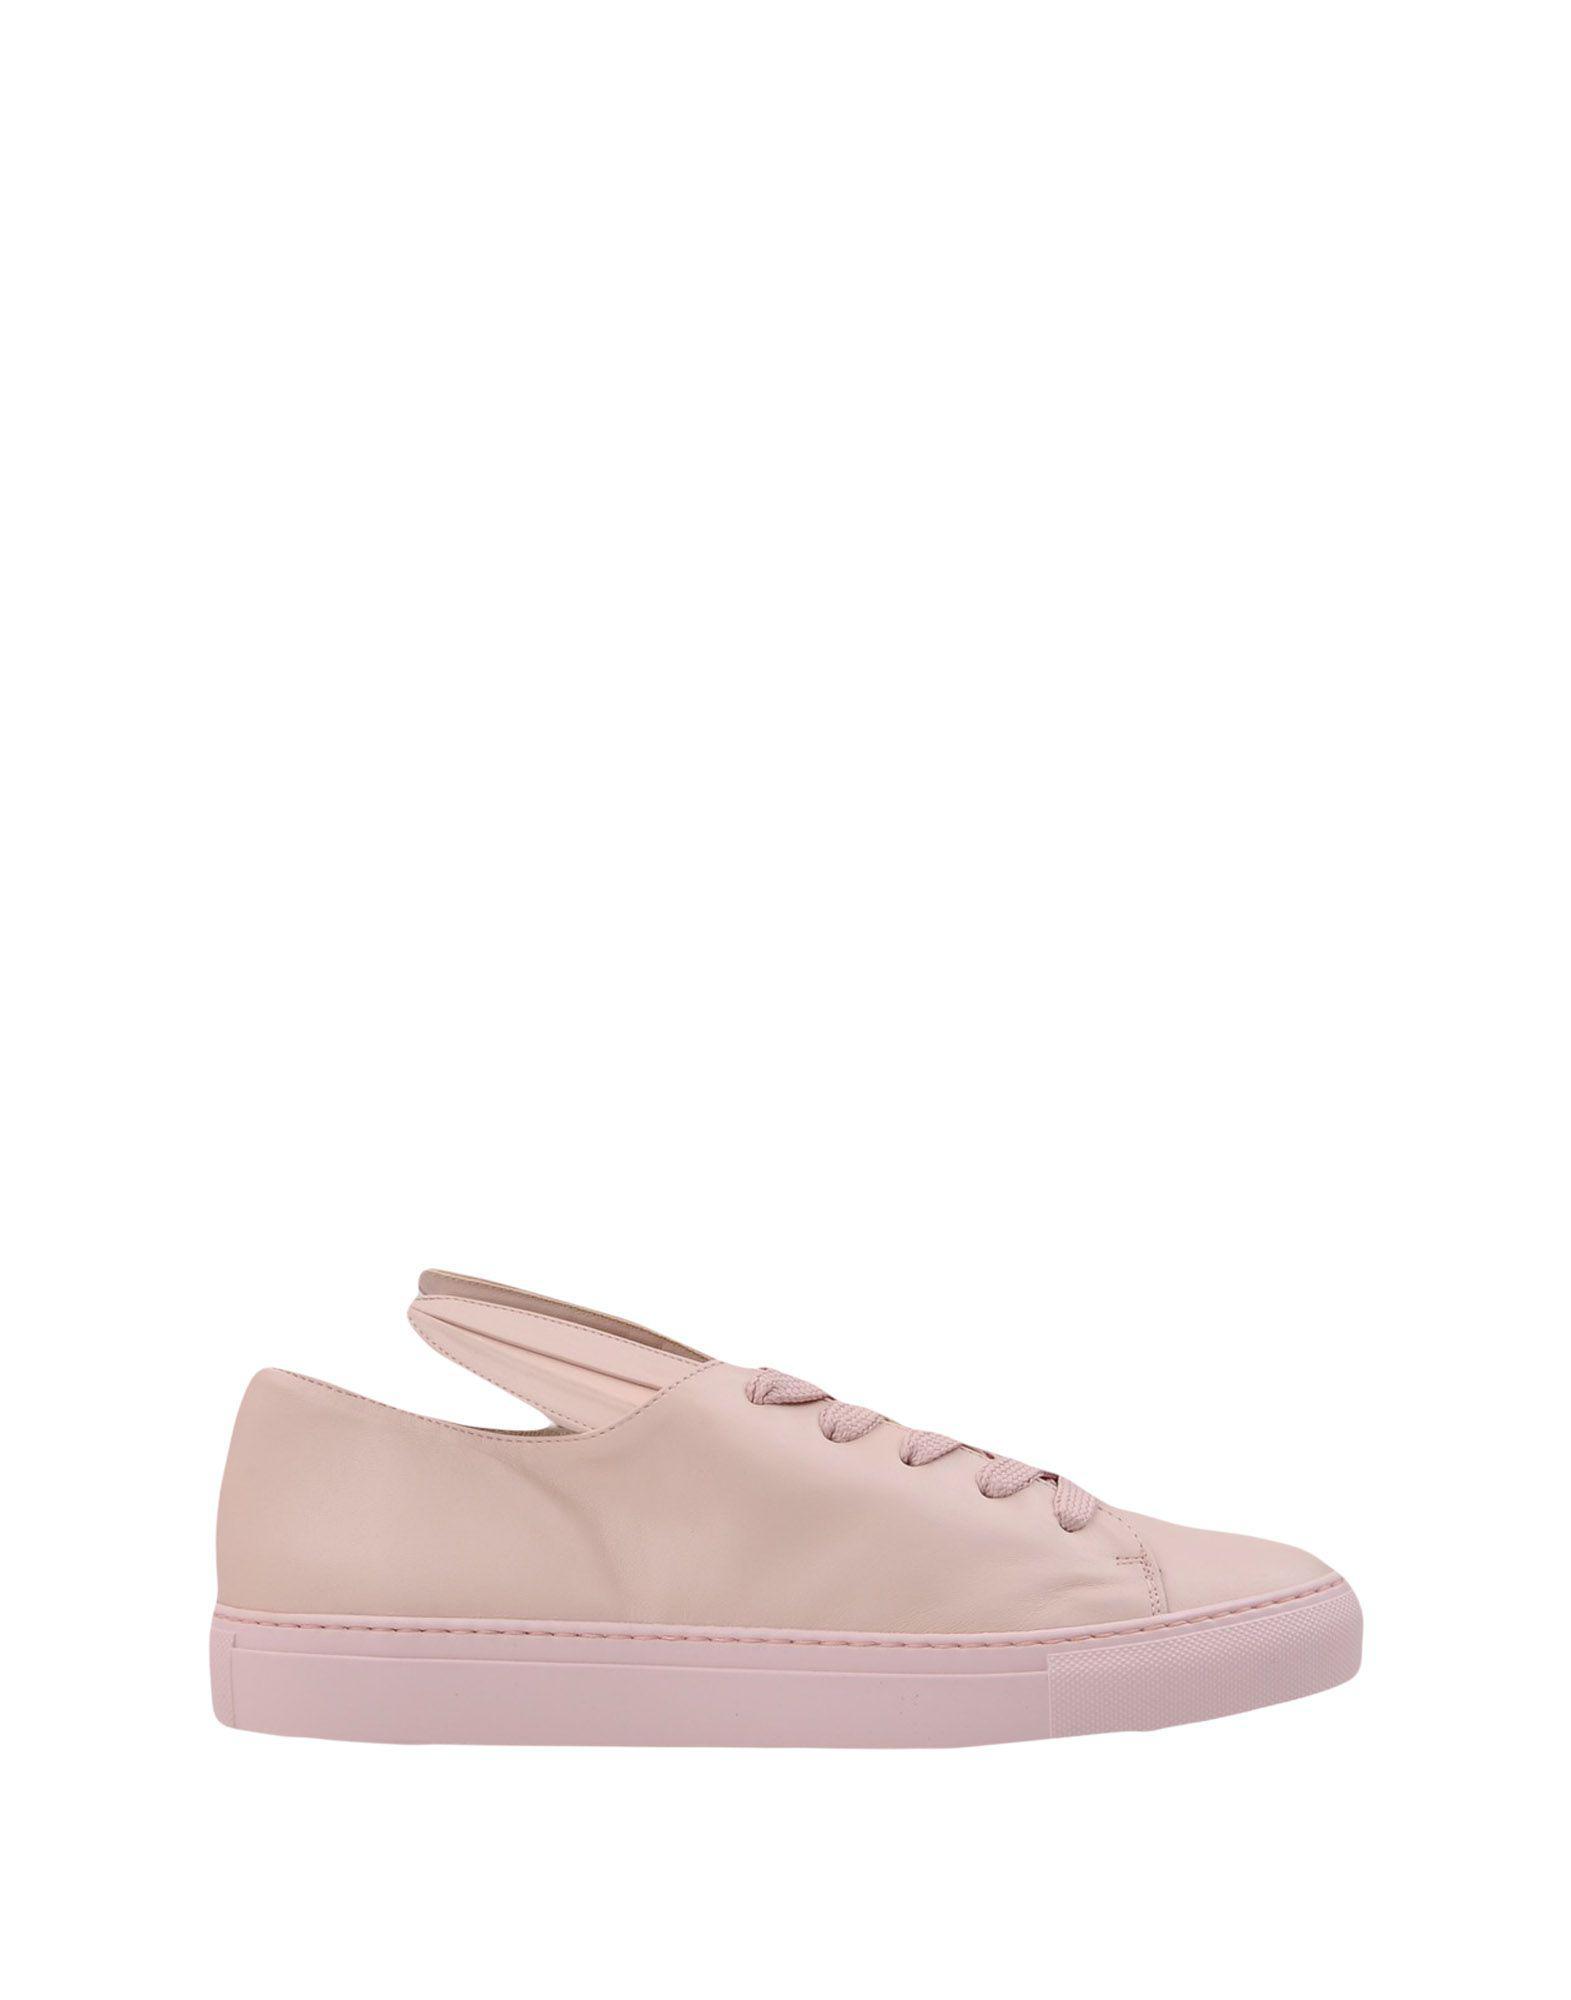 Minna Parikka Leather Low-tops & Sneakers in Light Pink (Pink)